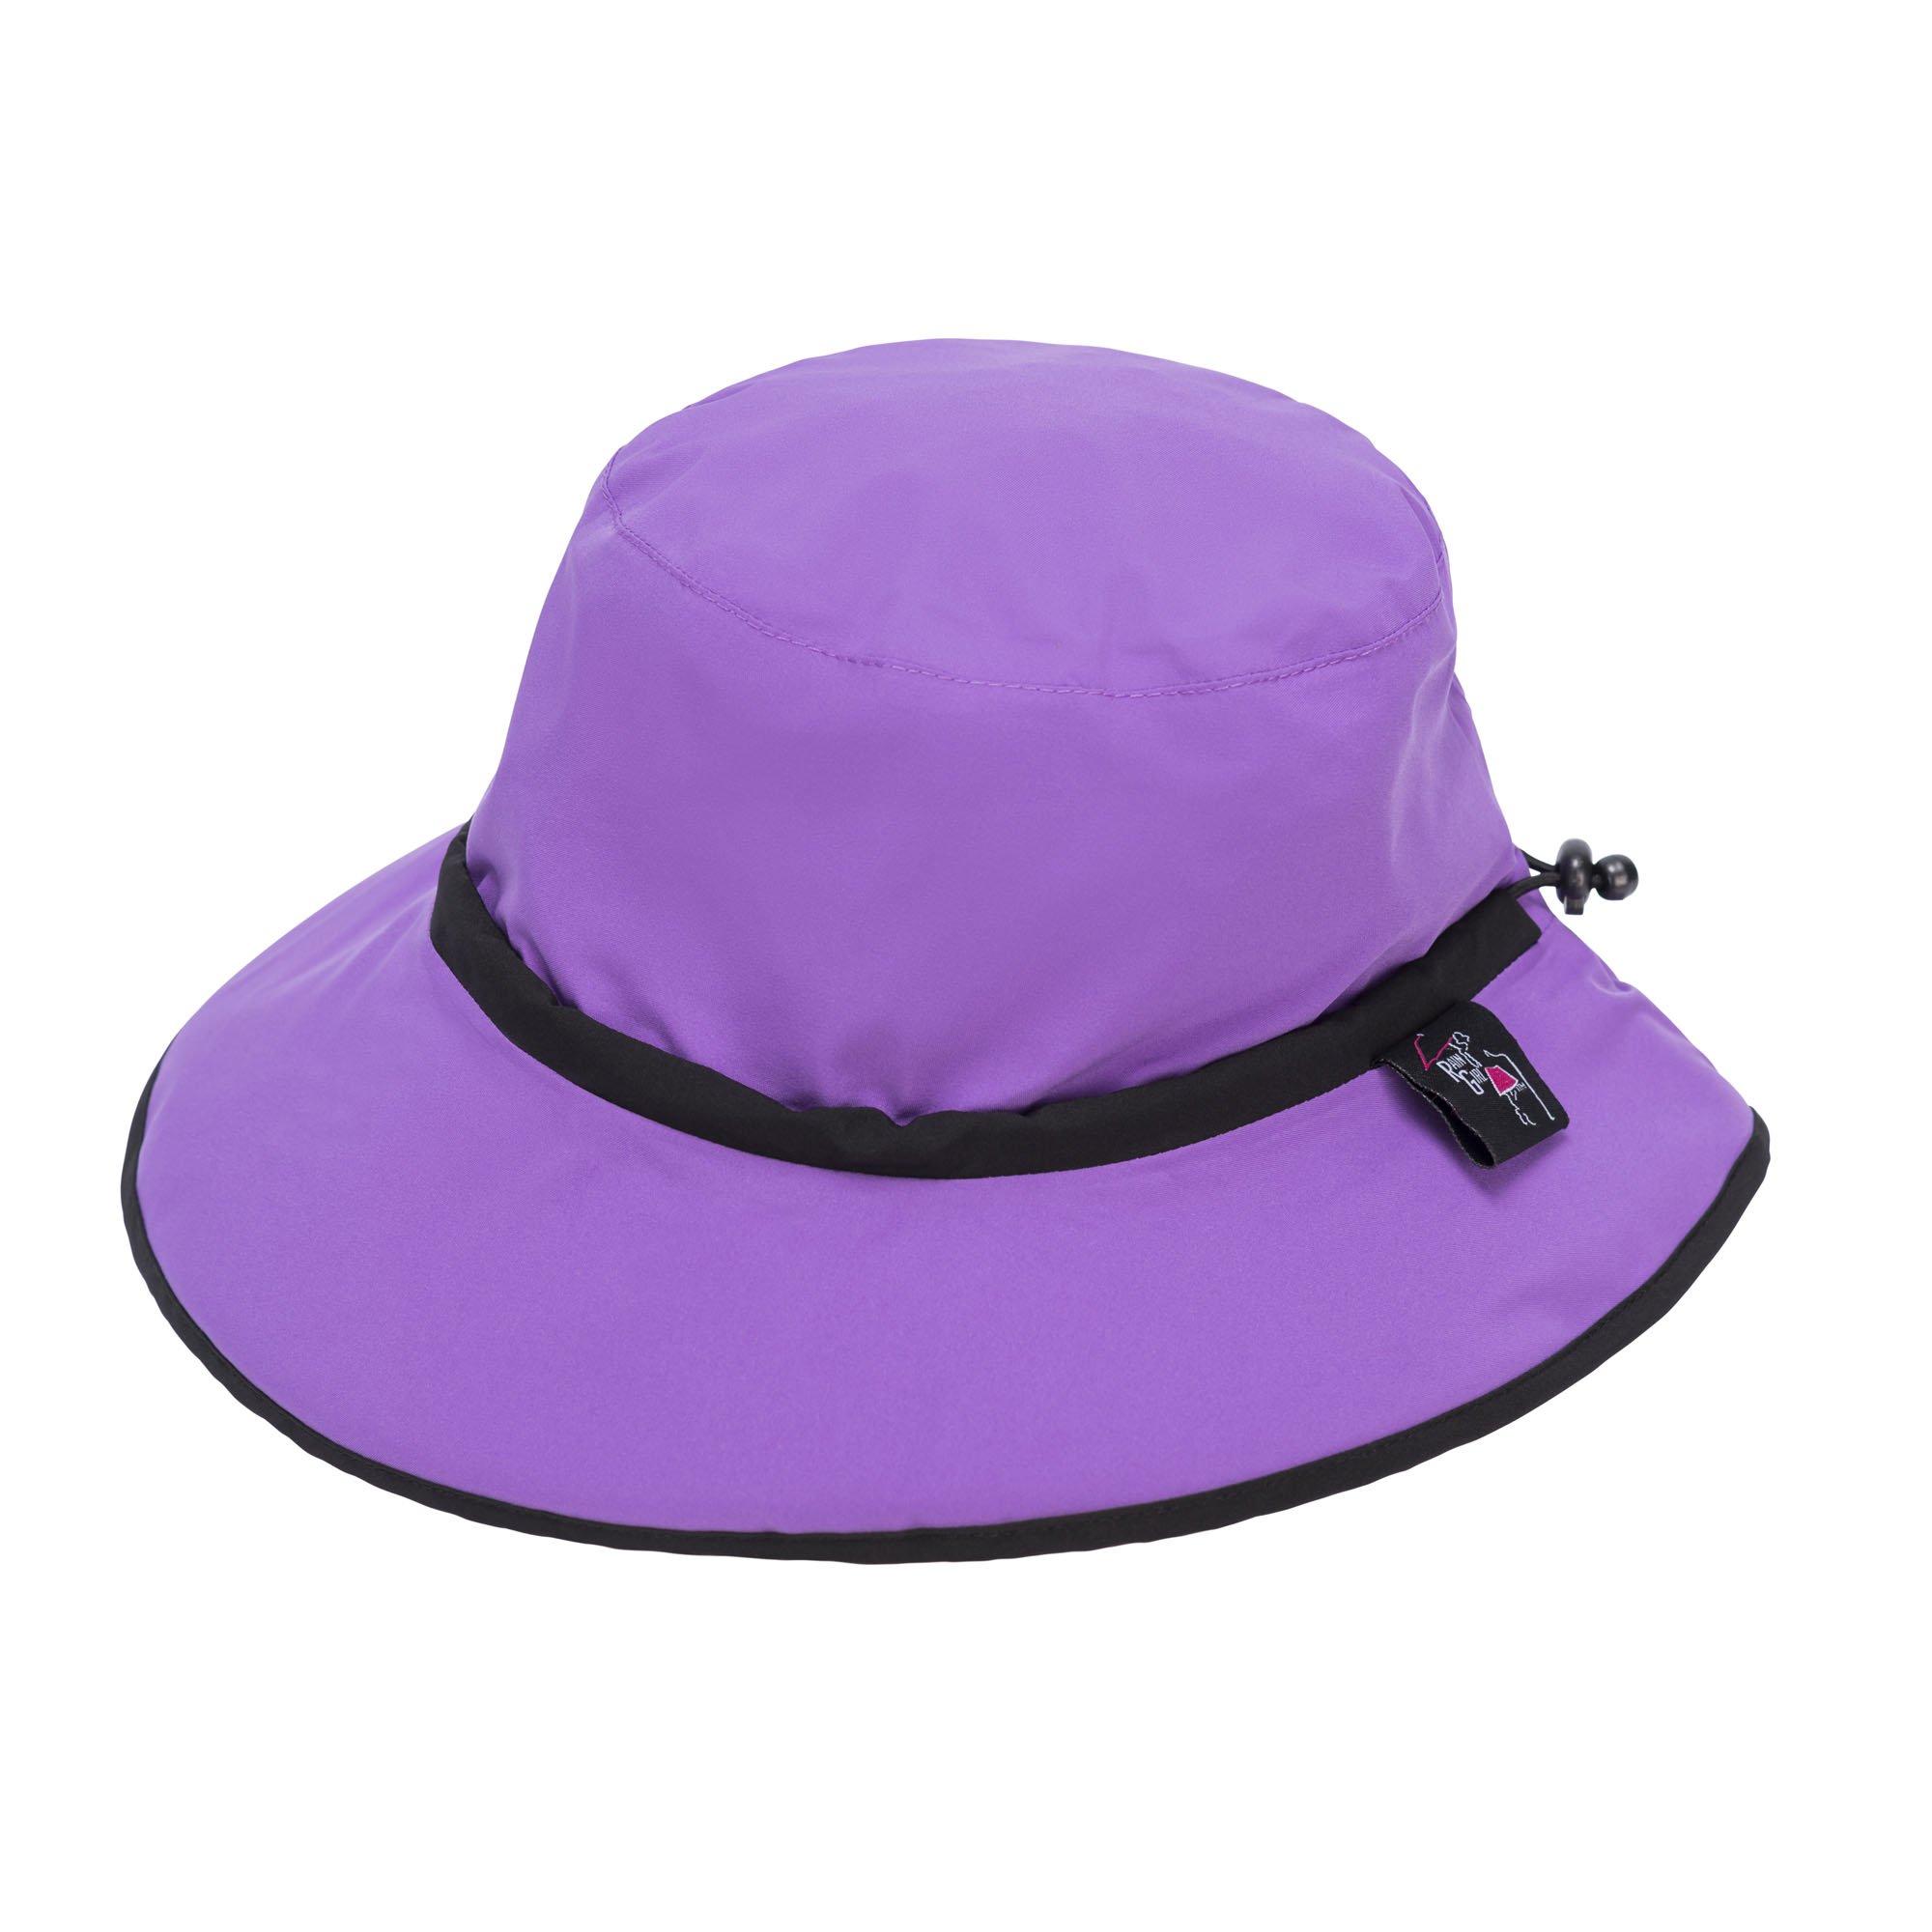 Rain Girl Golf Women's Rain Hat Purple with Black Trim